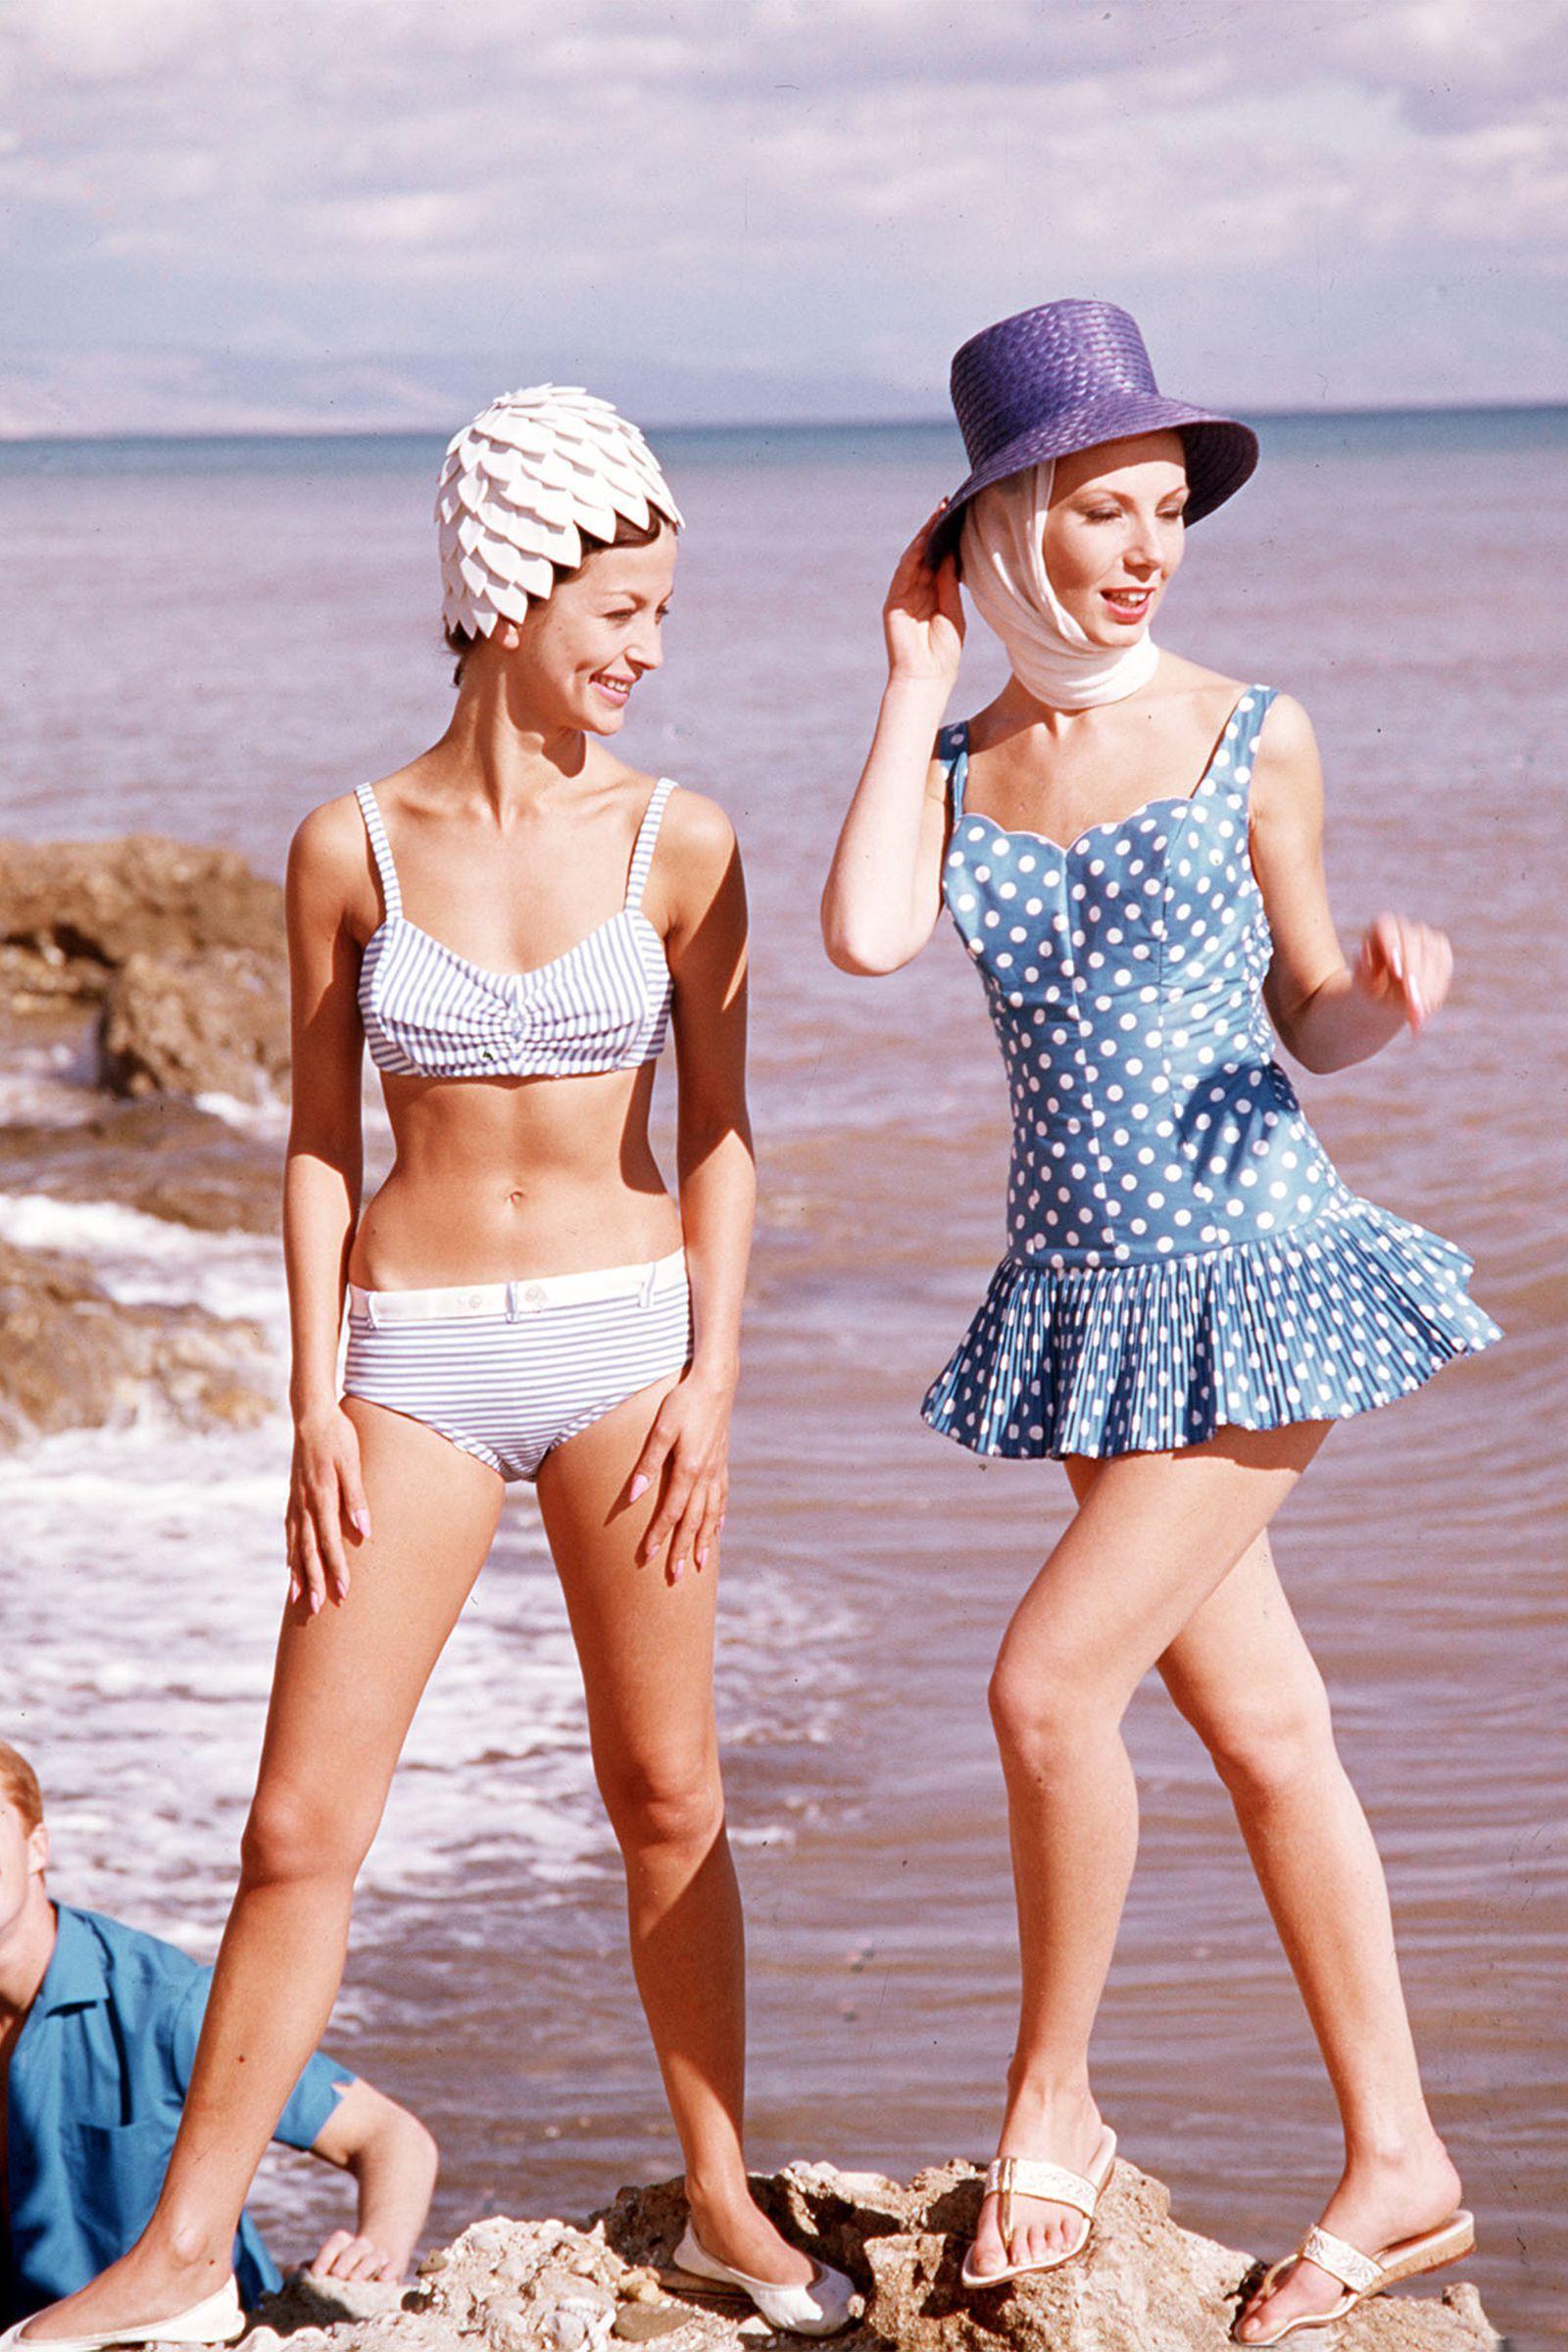 49f0cac073 1963 - HarpersBAZAAR.com 60s Fashion Trends